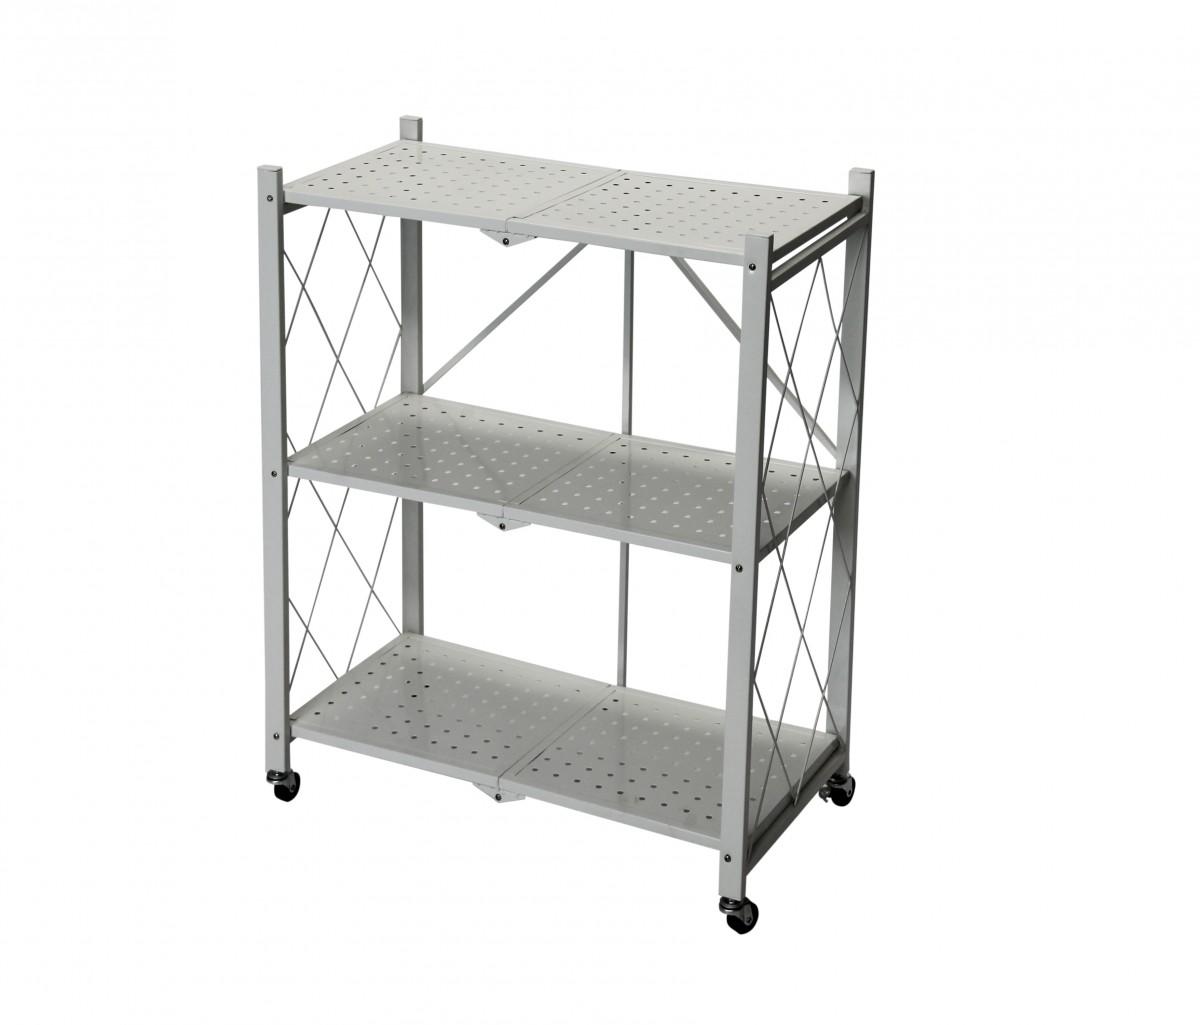 Fine Living Foldable Storage rack-White Metal 3 La